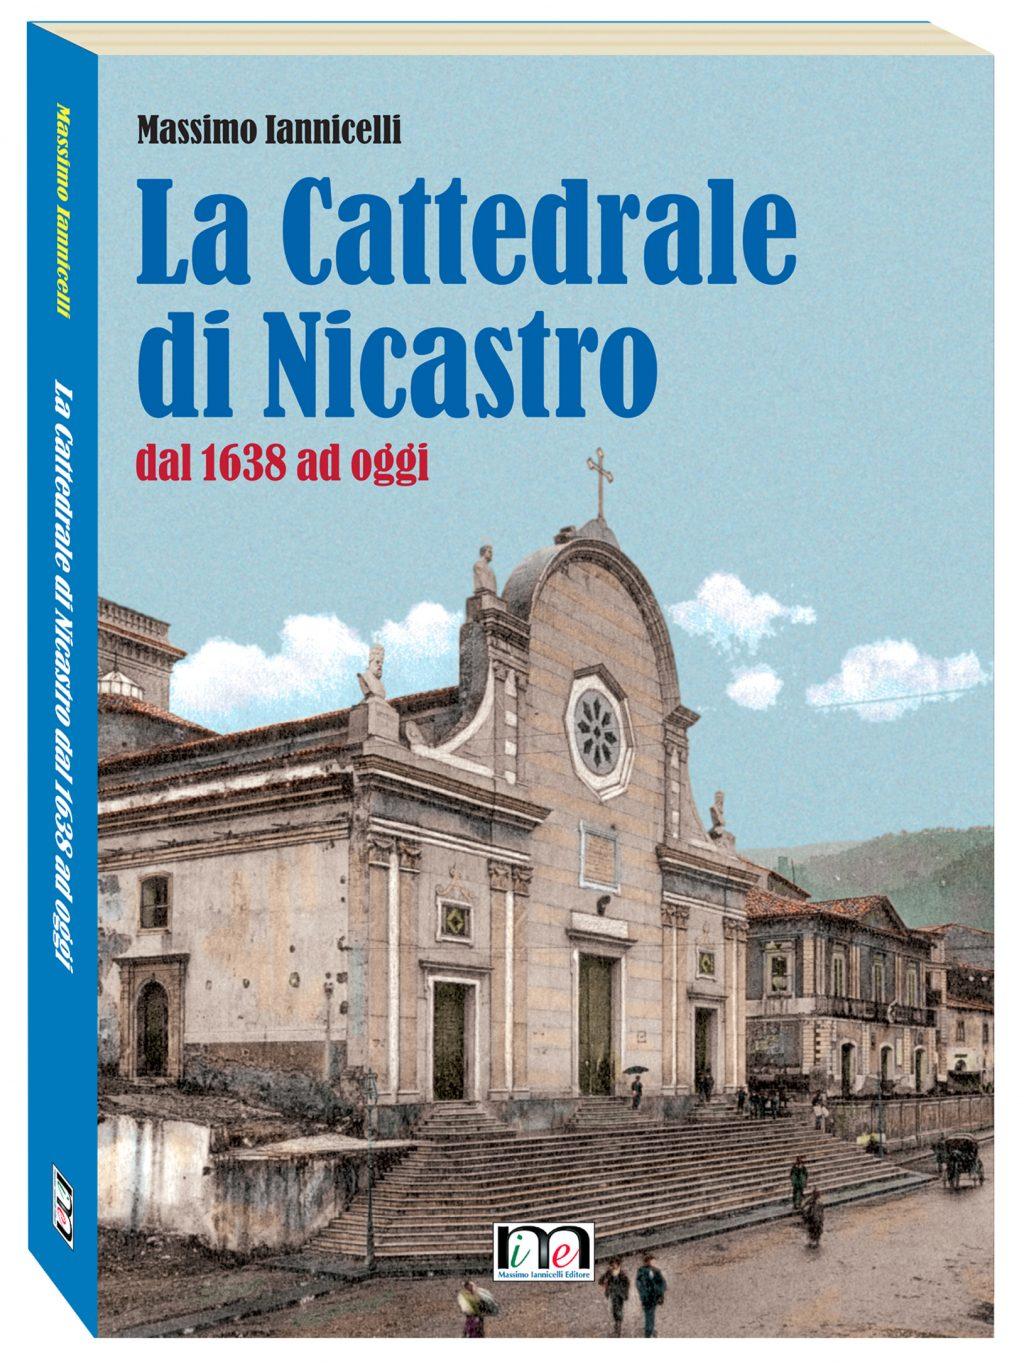 Copertina libro Iannicelli - LameziaTerme.it